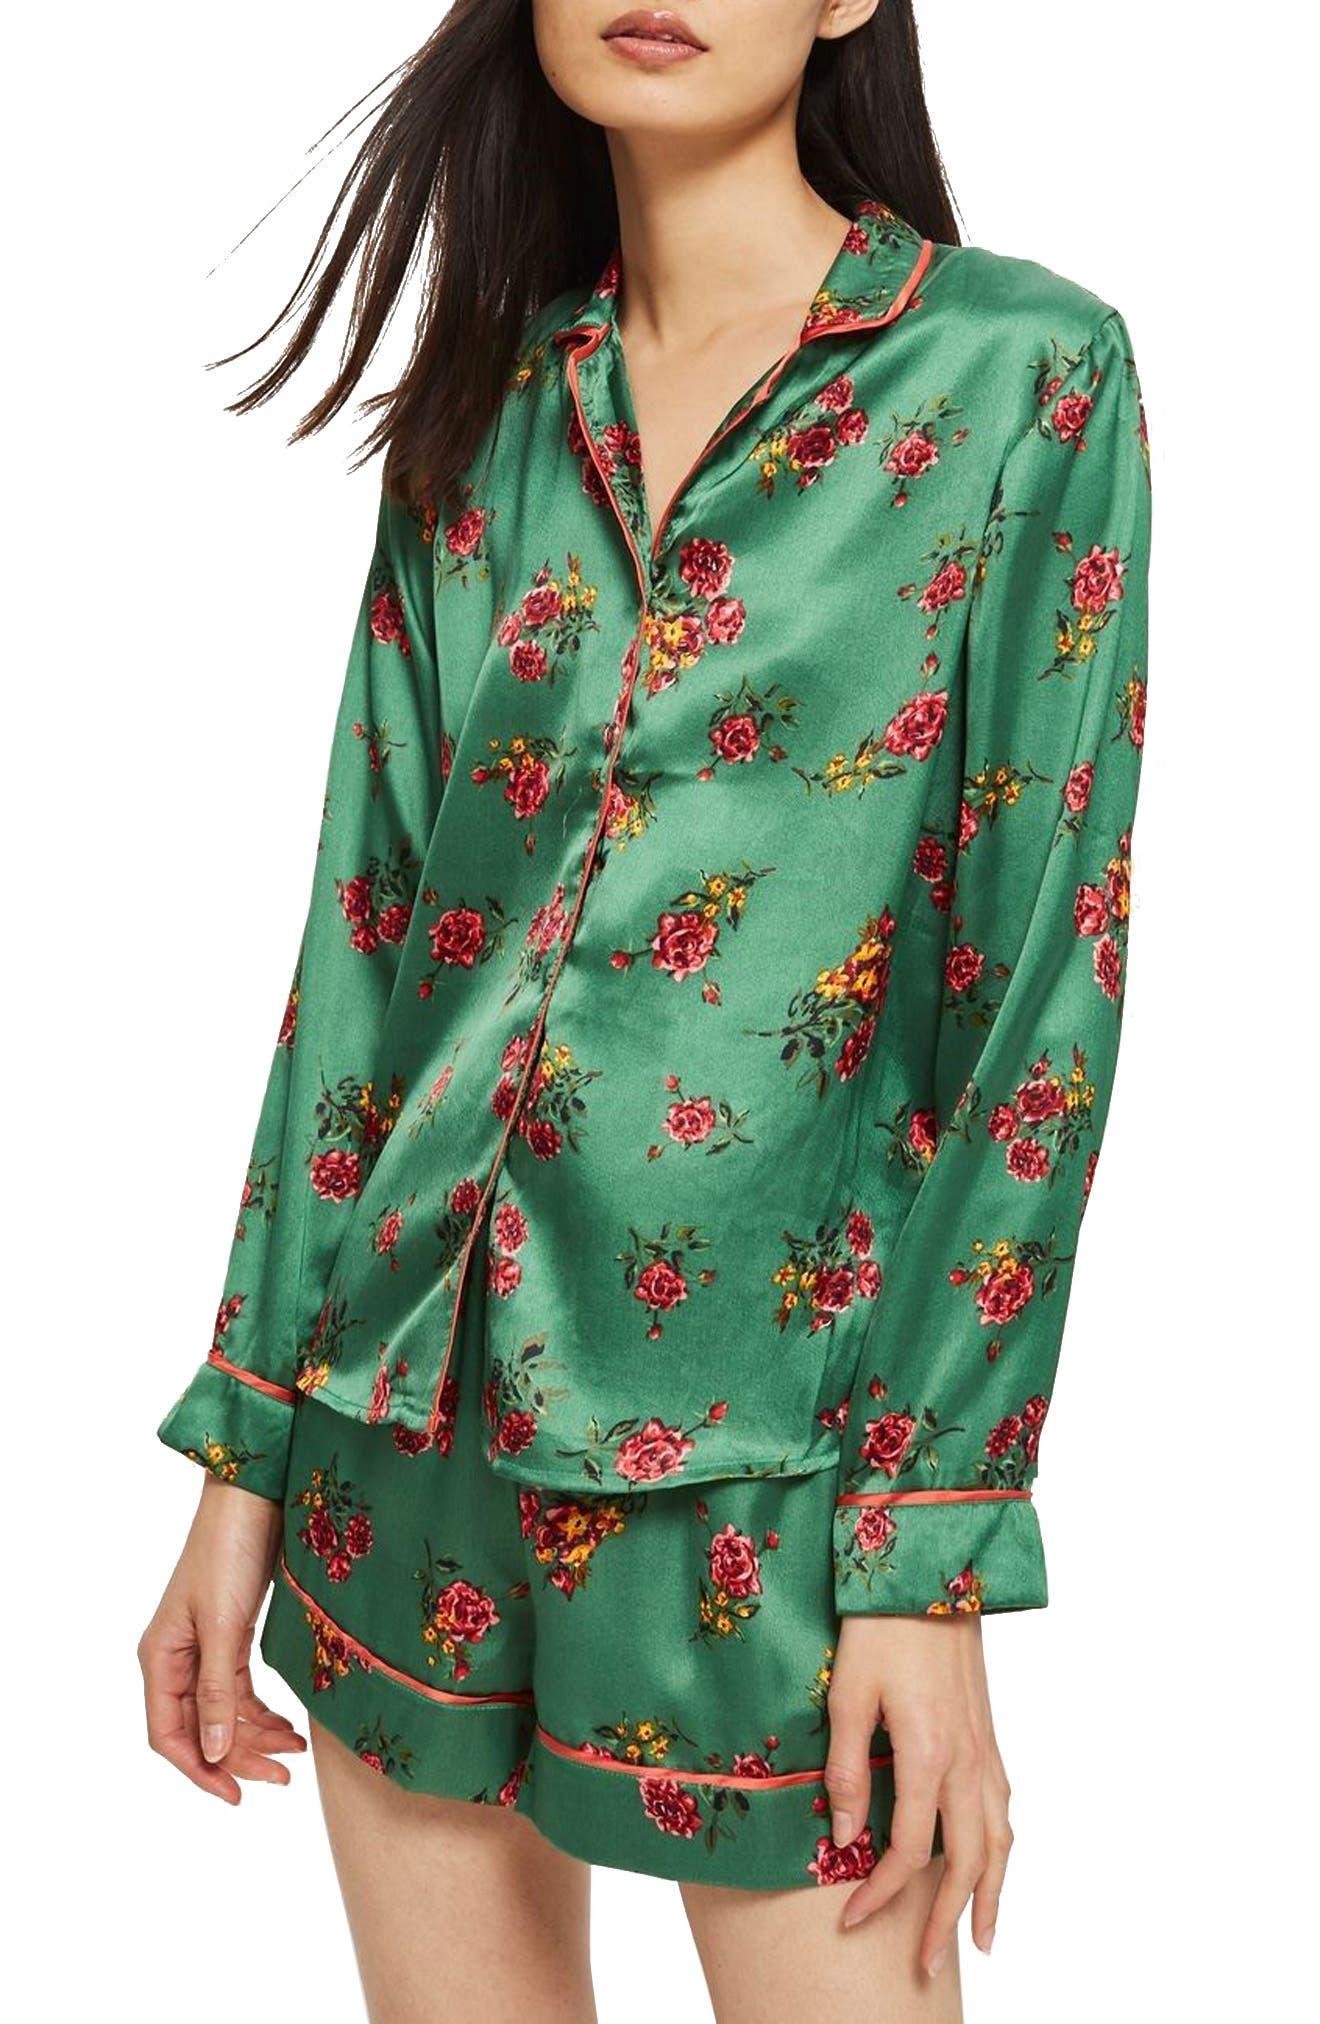 Floral Print Pajama Shirt,                         Main,                         color, Bright Green Multi